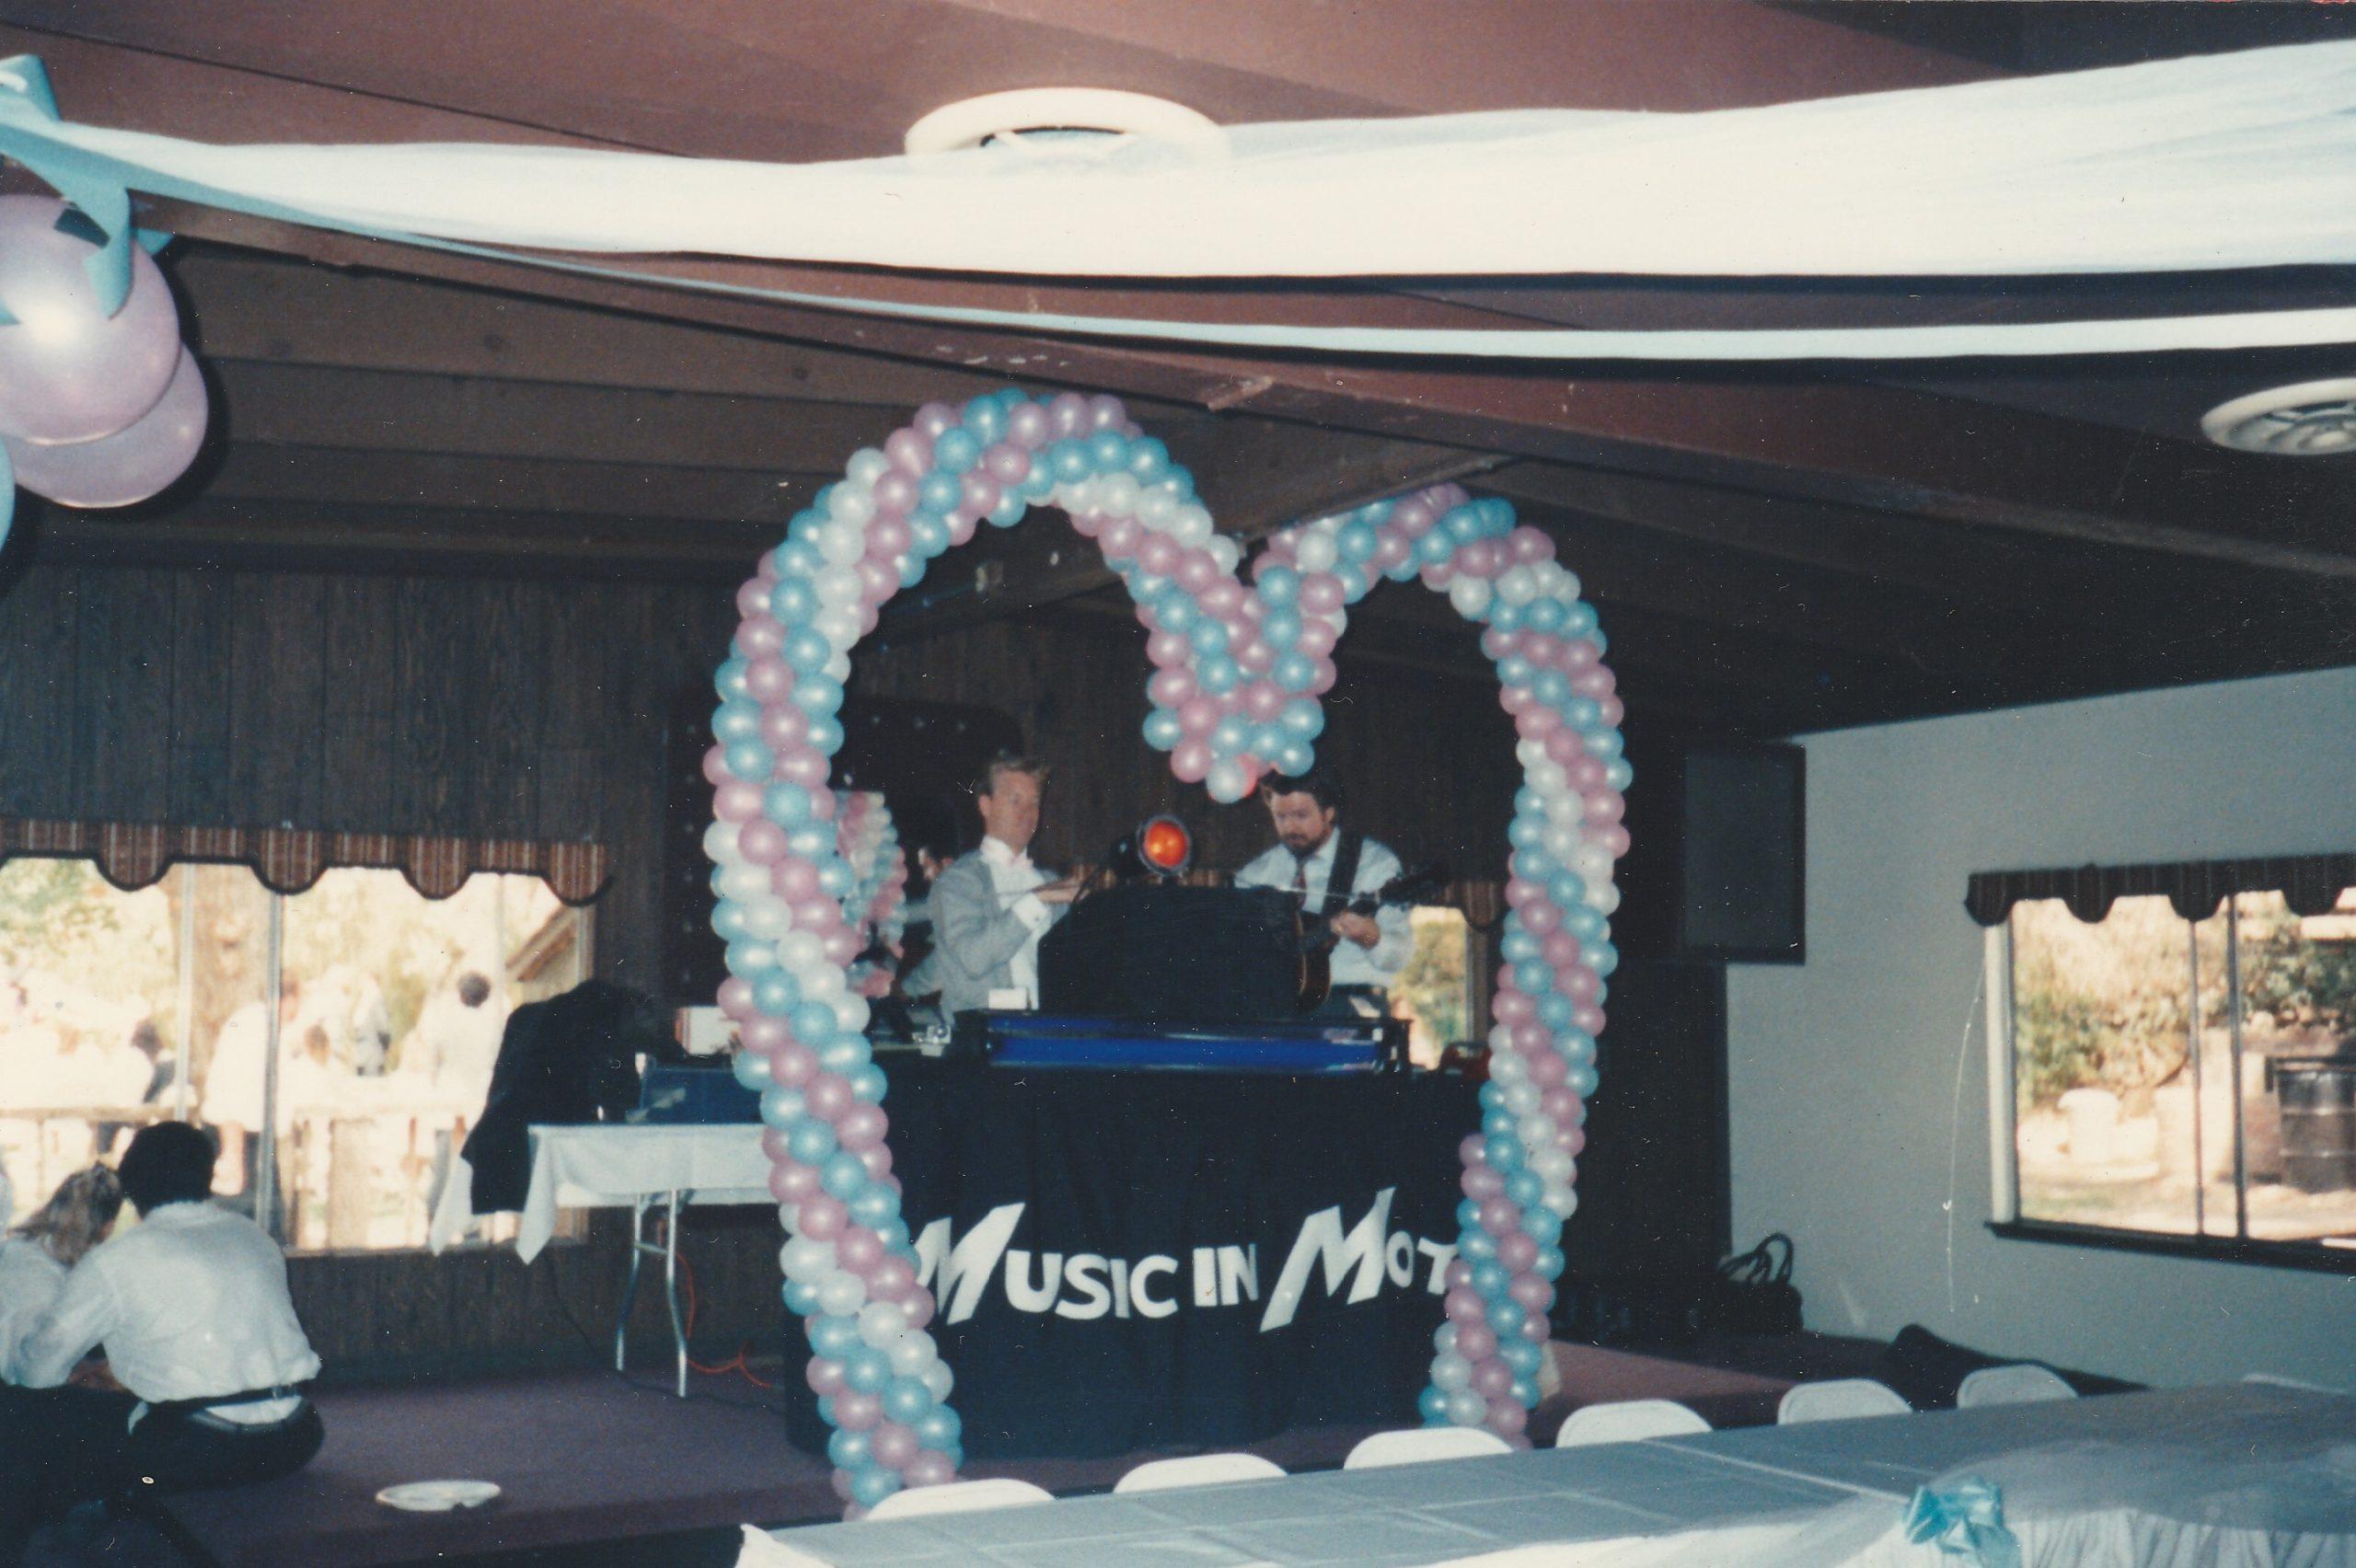 When wedding balloon arches ruled